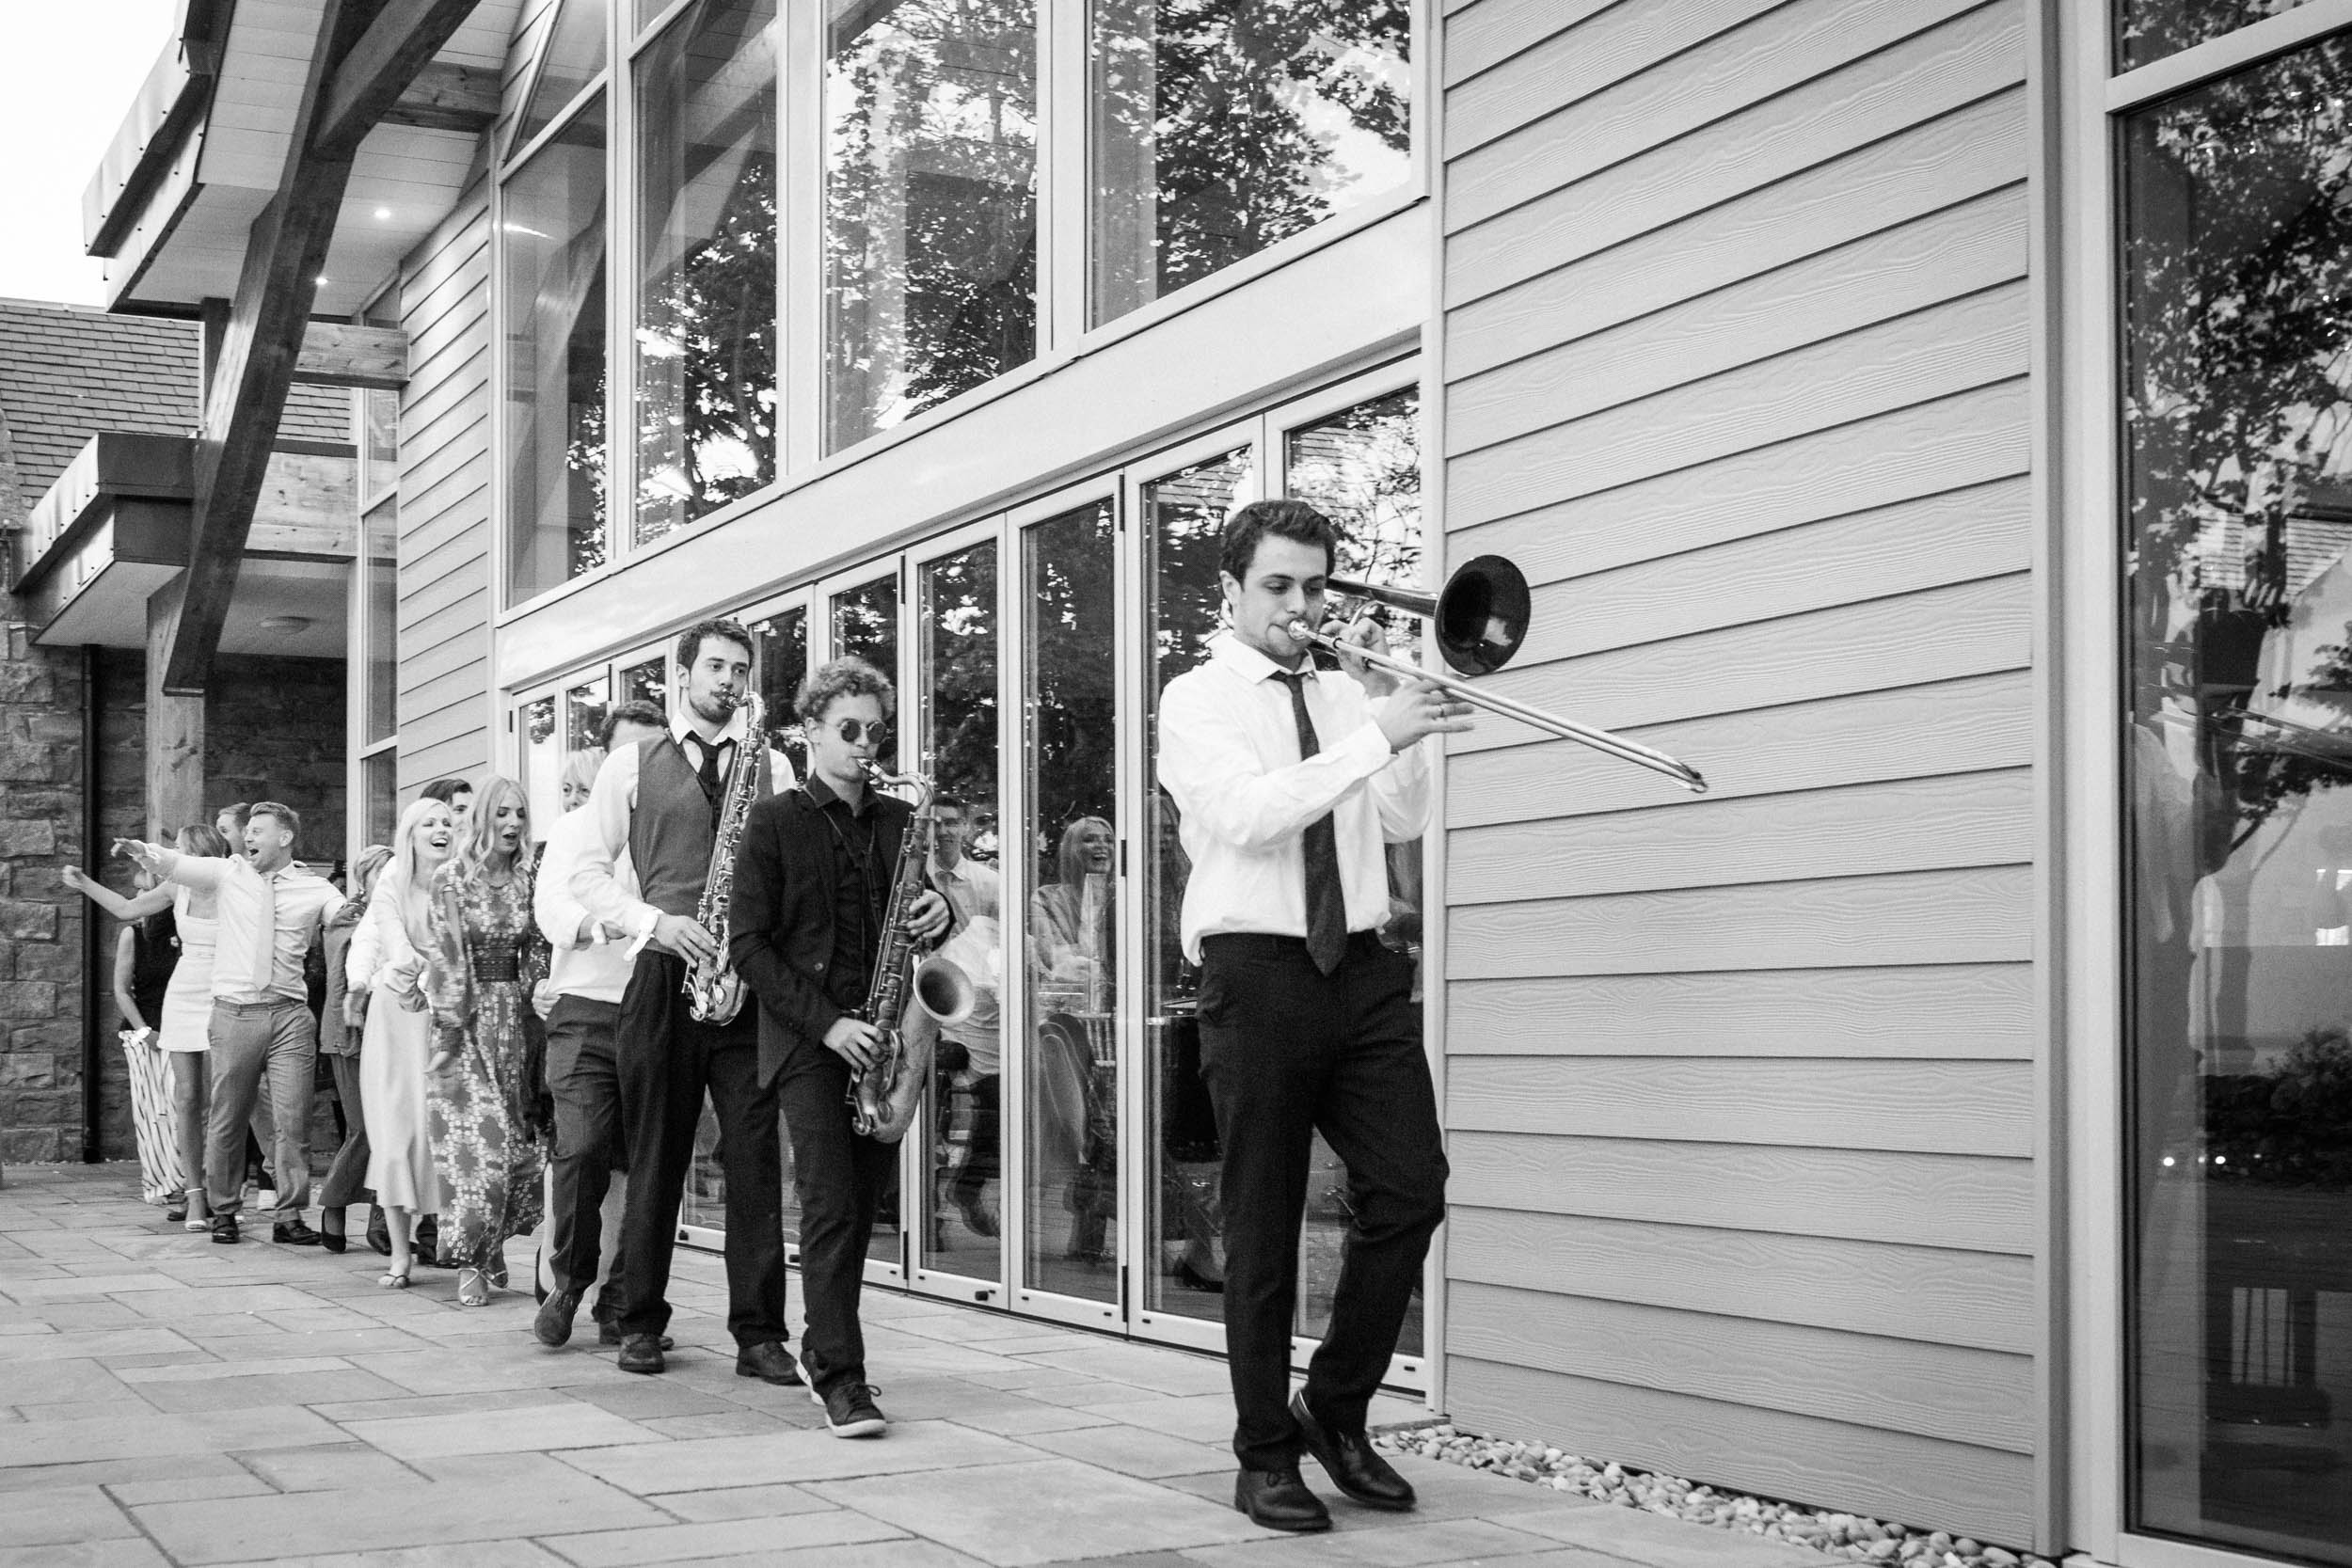 Alex_Sedgmond_Photography-SouthWalesWeddingPhotography-Wedding-Photographer-Cardiff-126.jpg